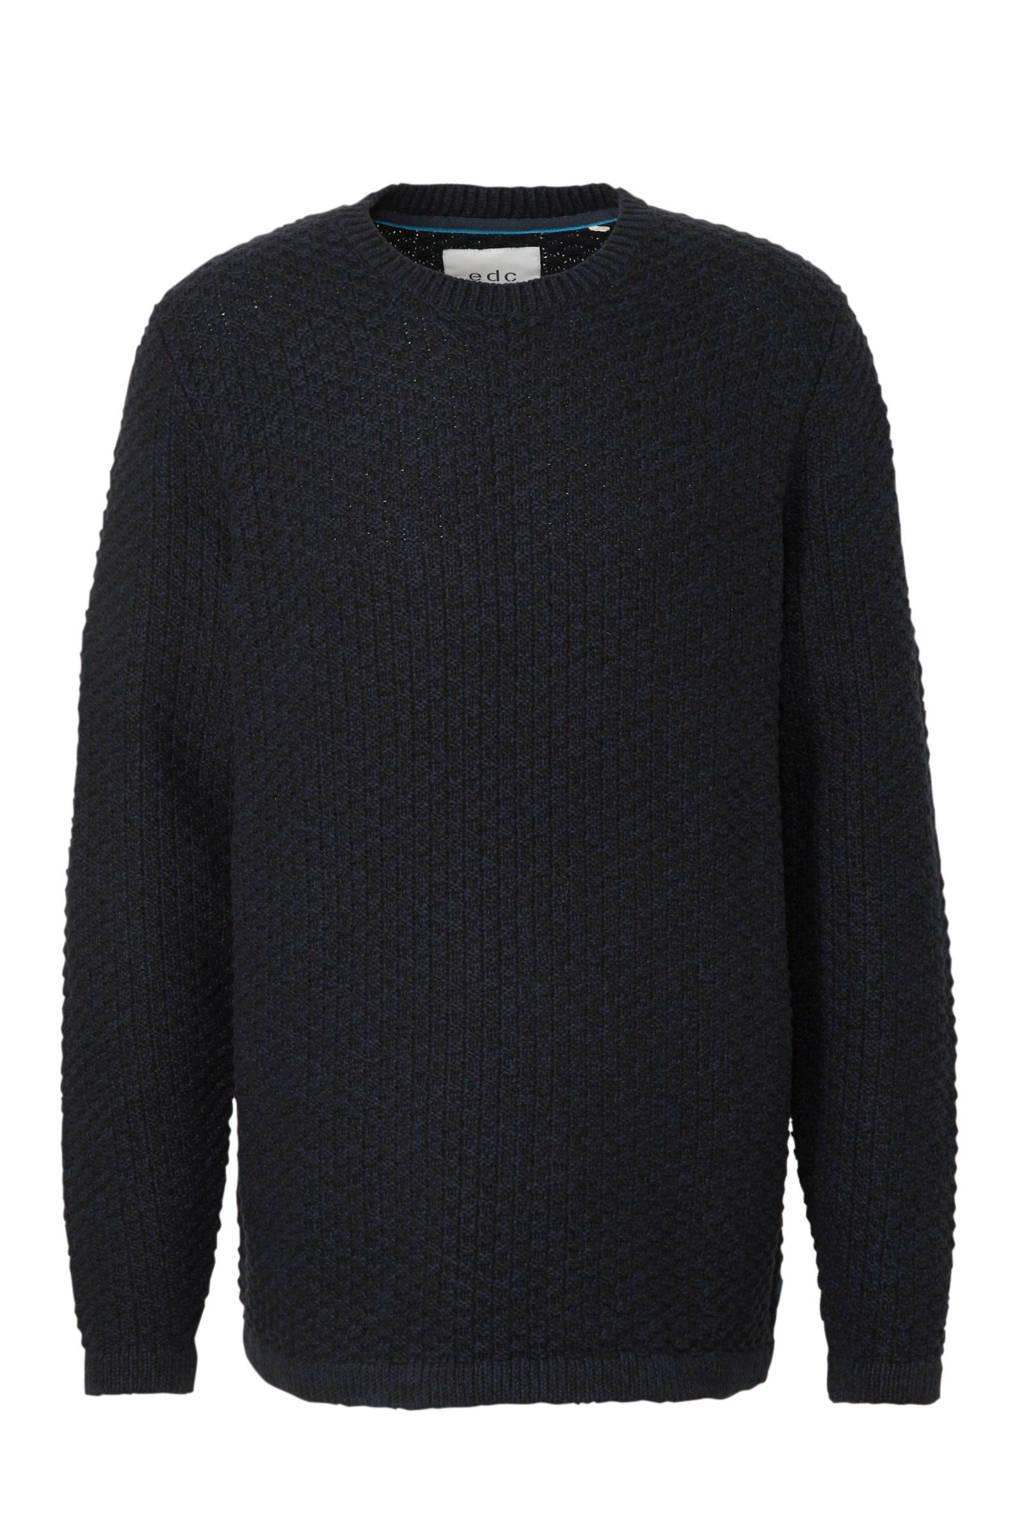 ESPRIT Men Casual sweater met textuur marine, Marine